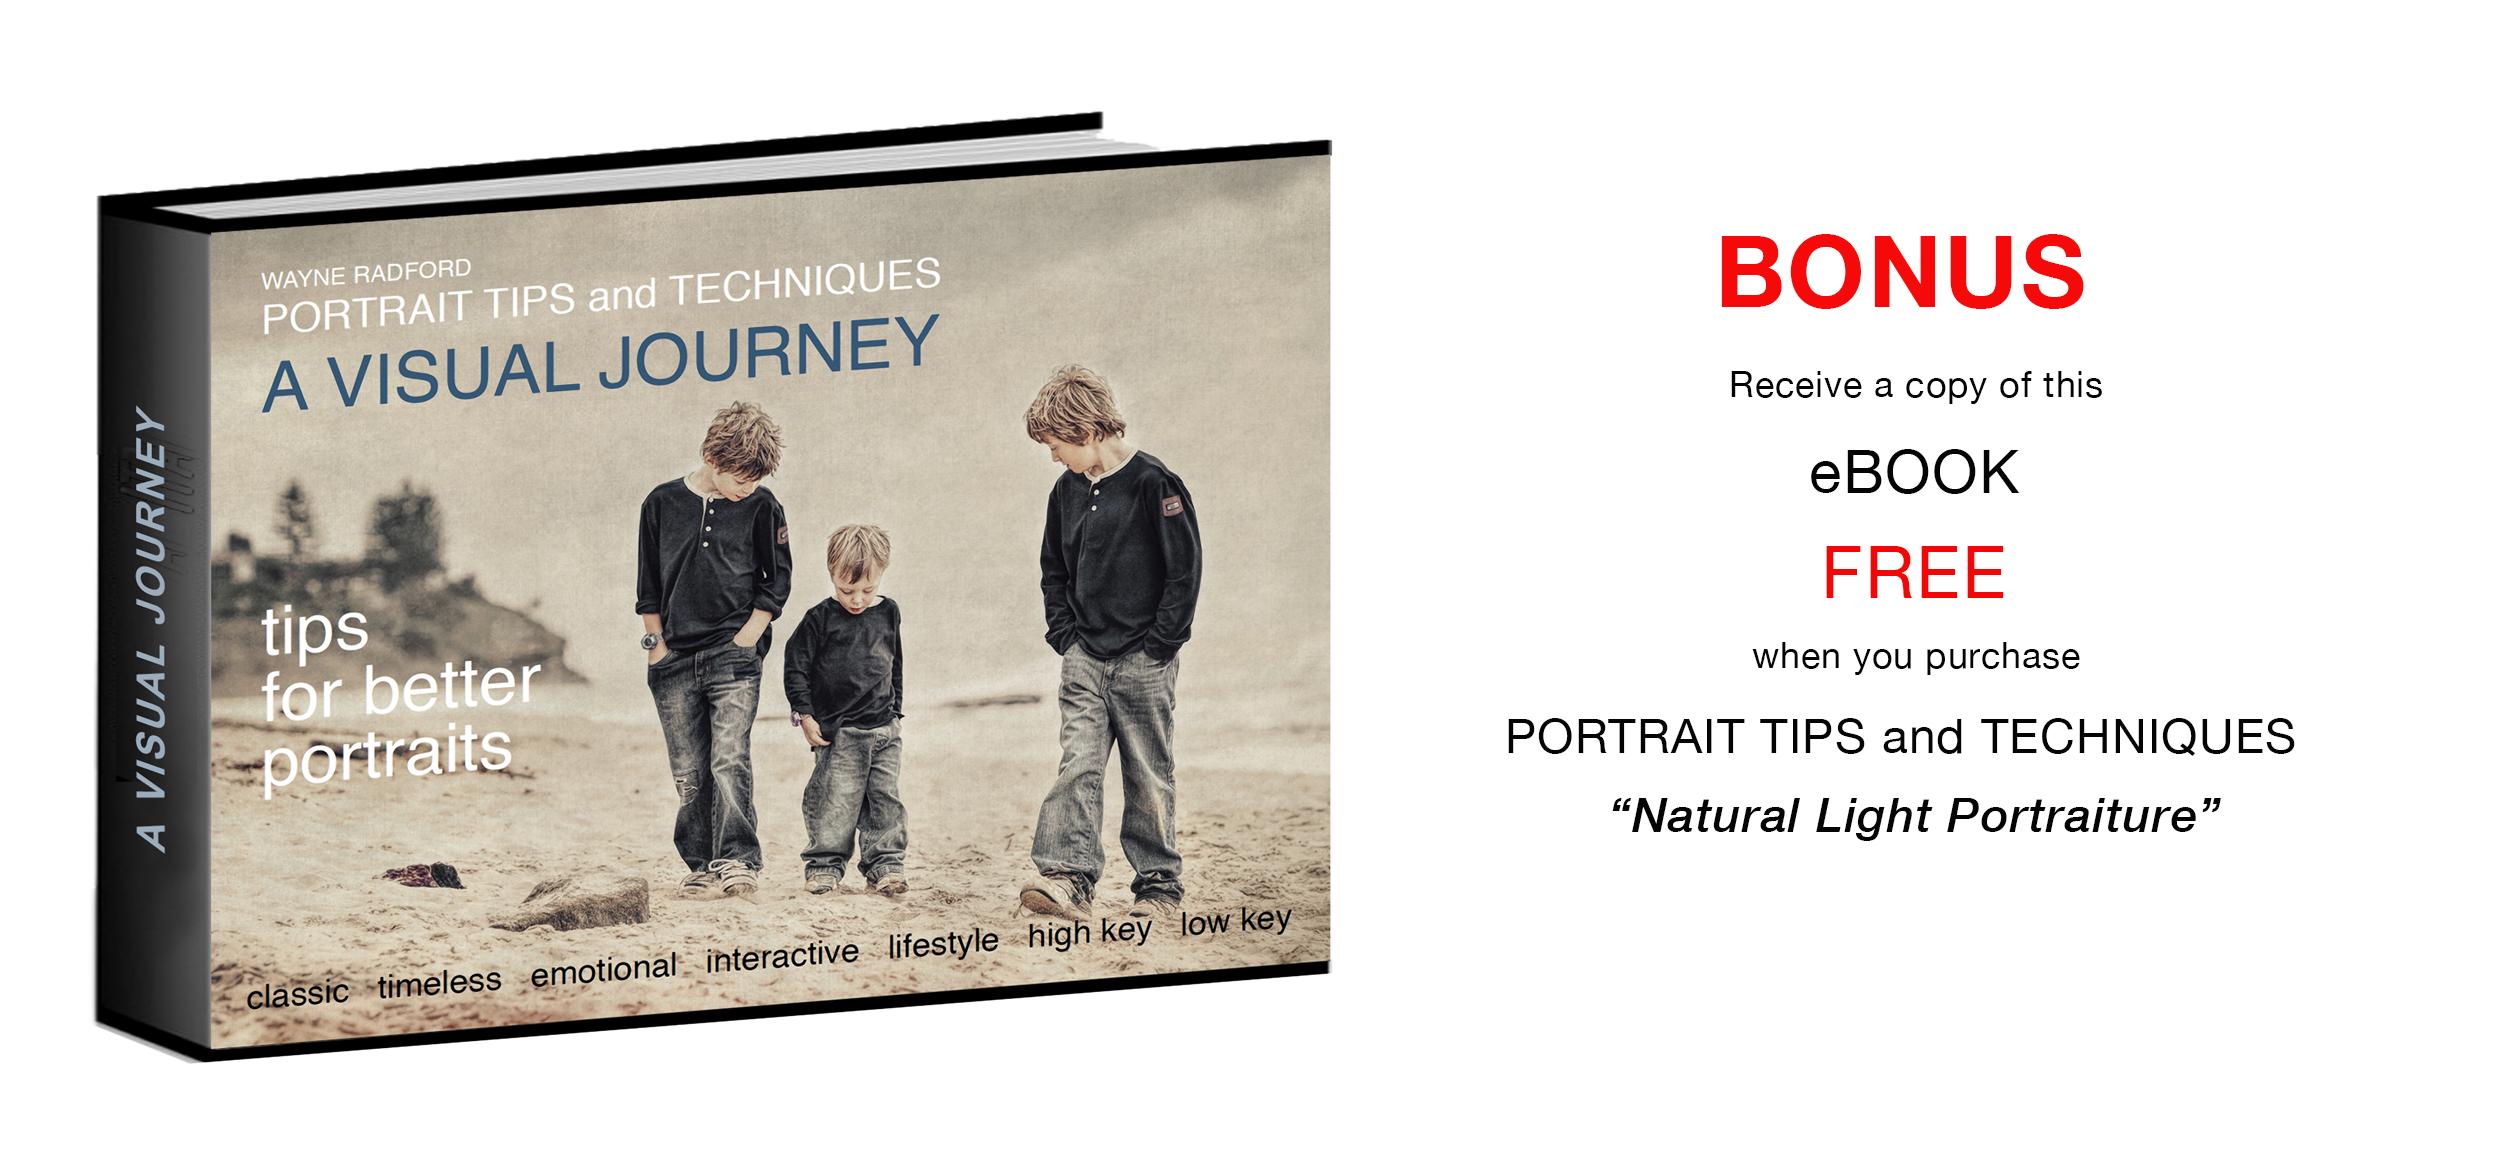 BONUS BOOK 2.jpg